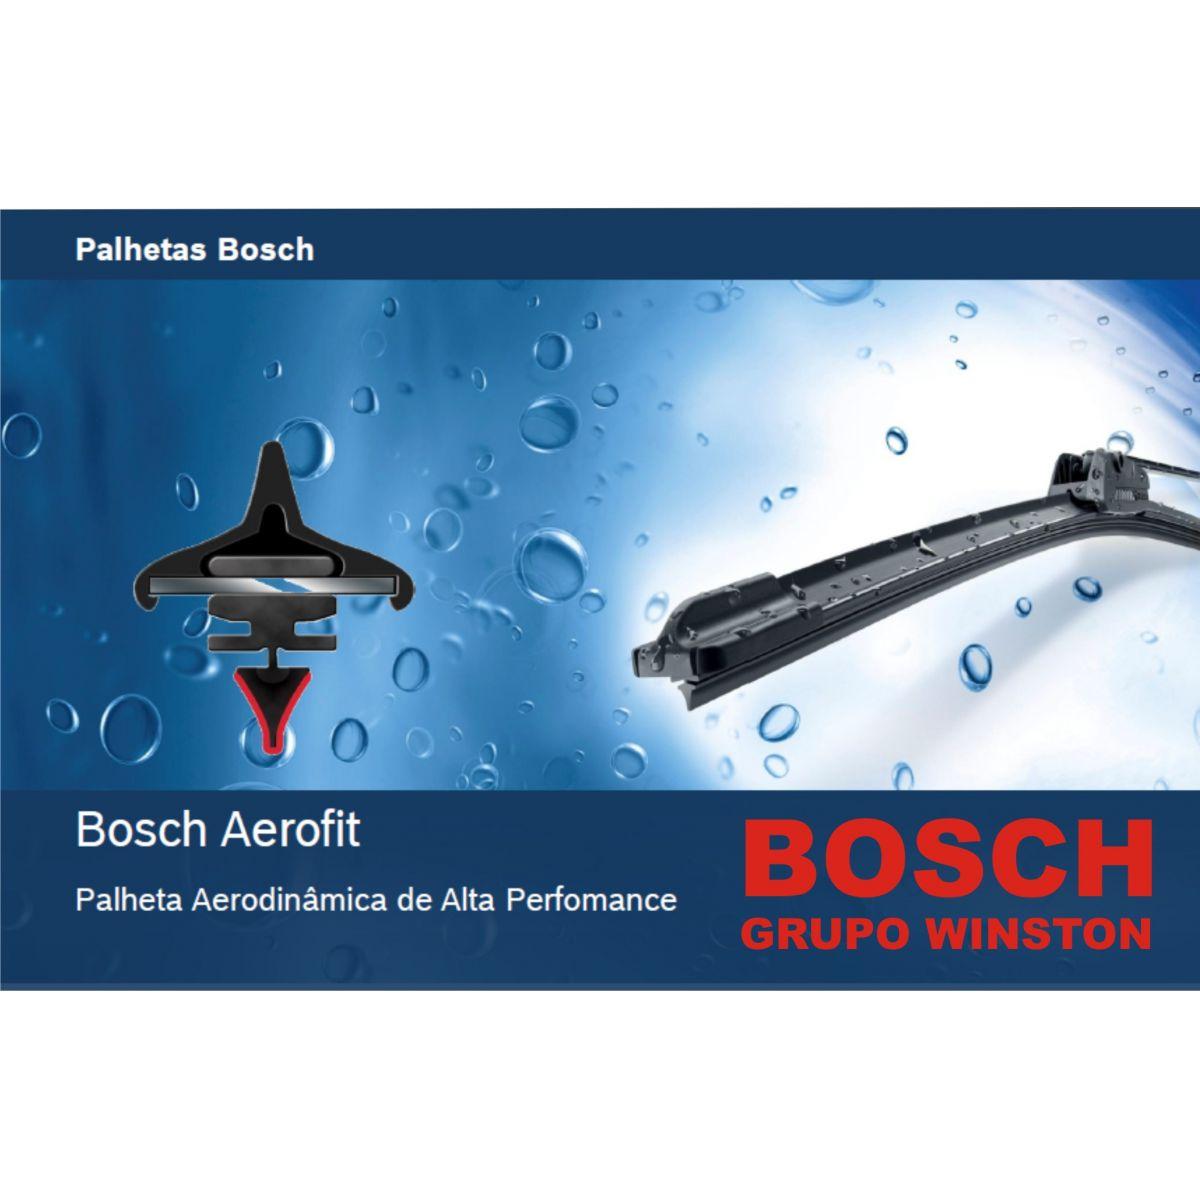 Palheta Bosch Aerofit Limpador de para brisa Bosch NISSAN Maxima Primera Terrano